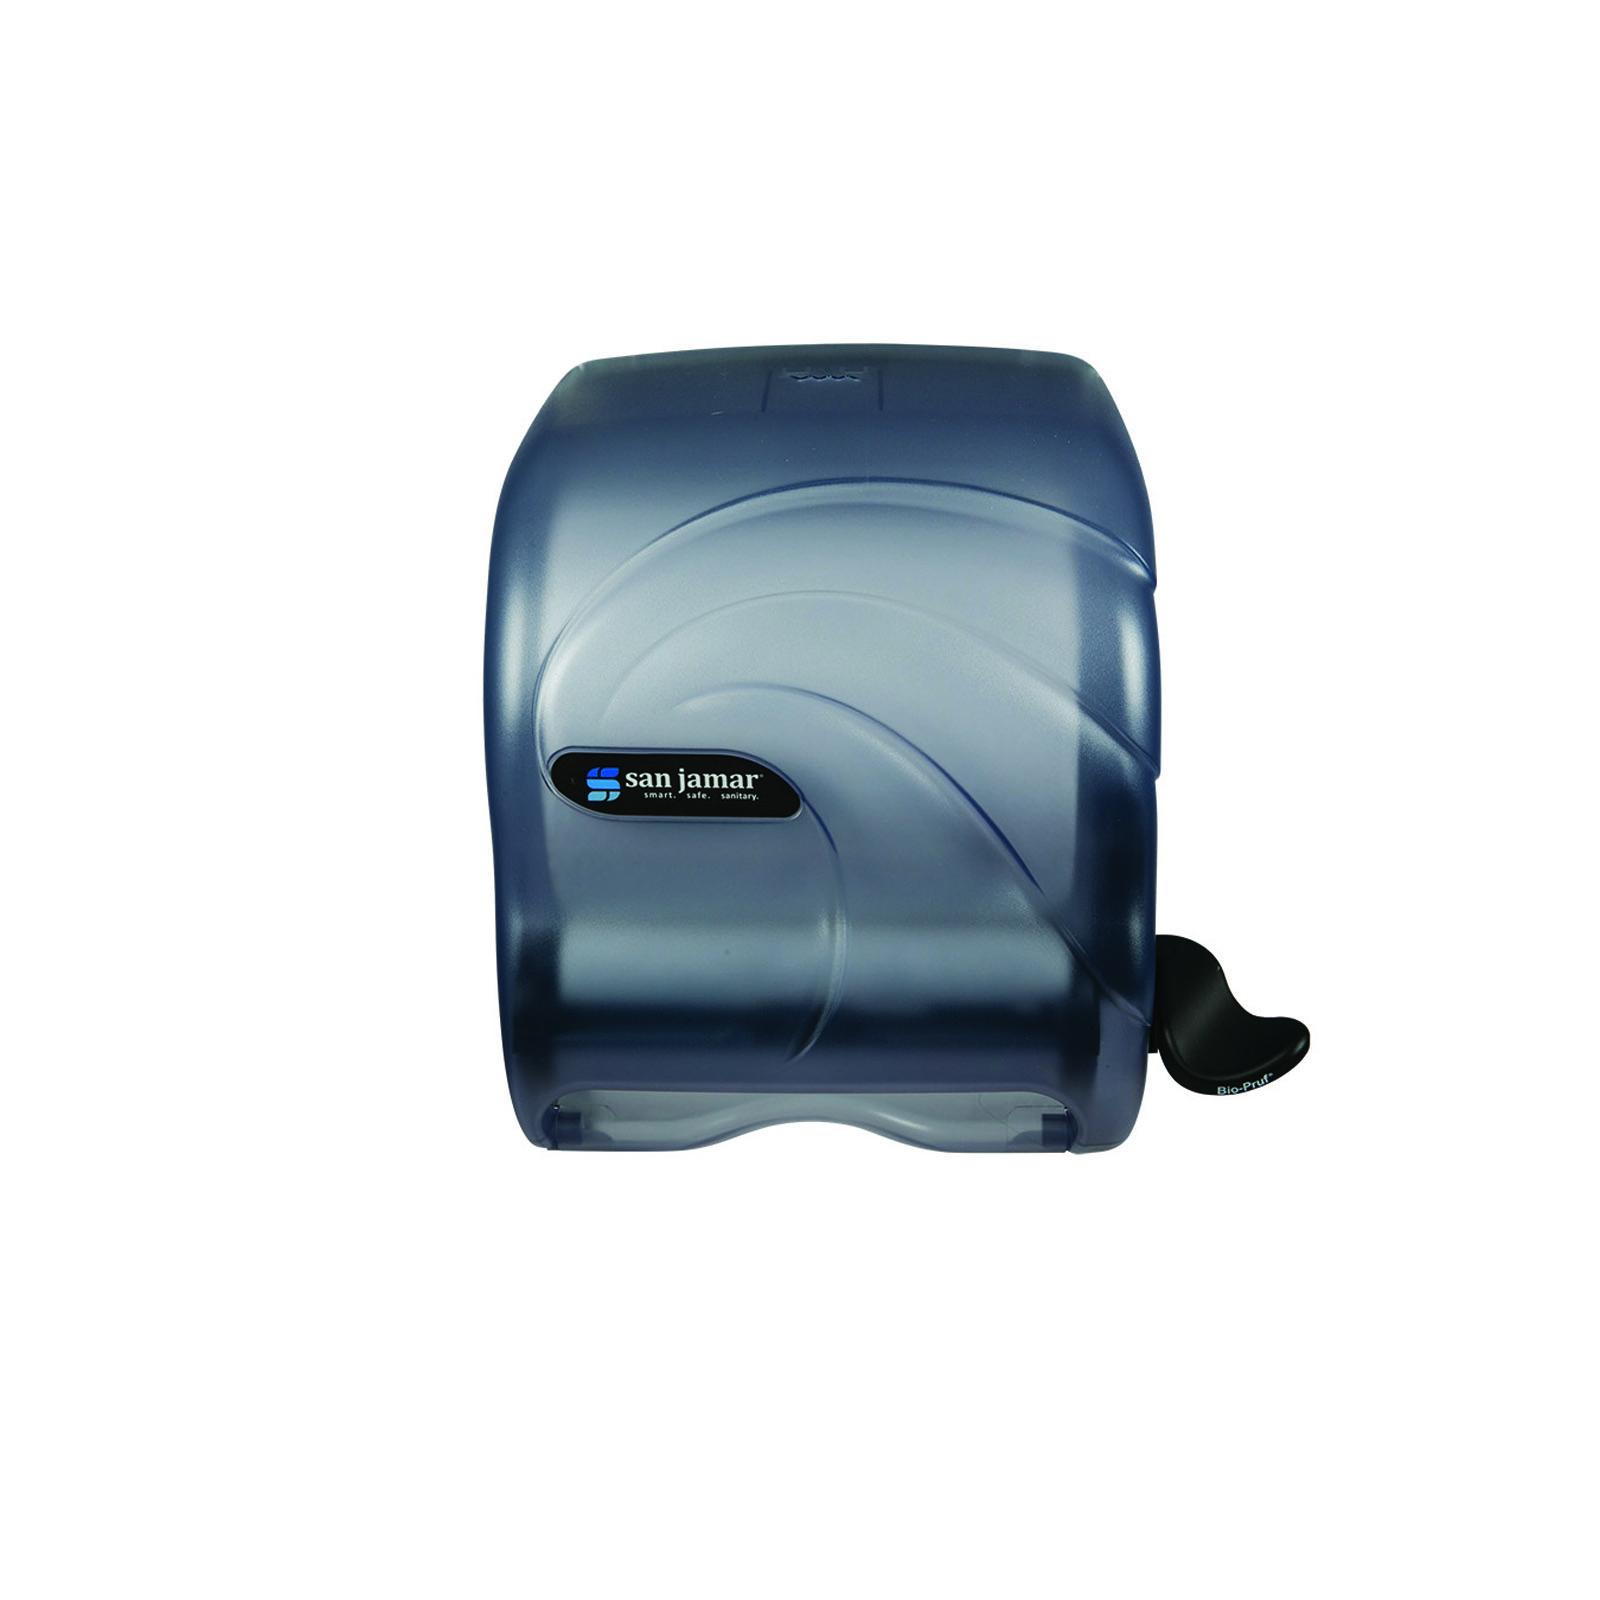 San Jamar T990TBL paper towel dispenser